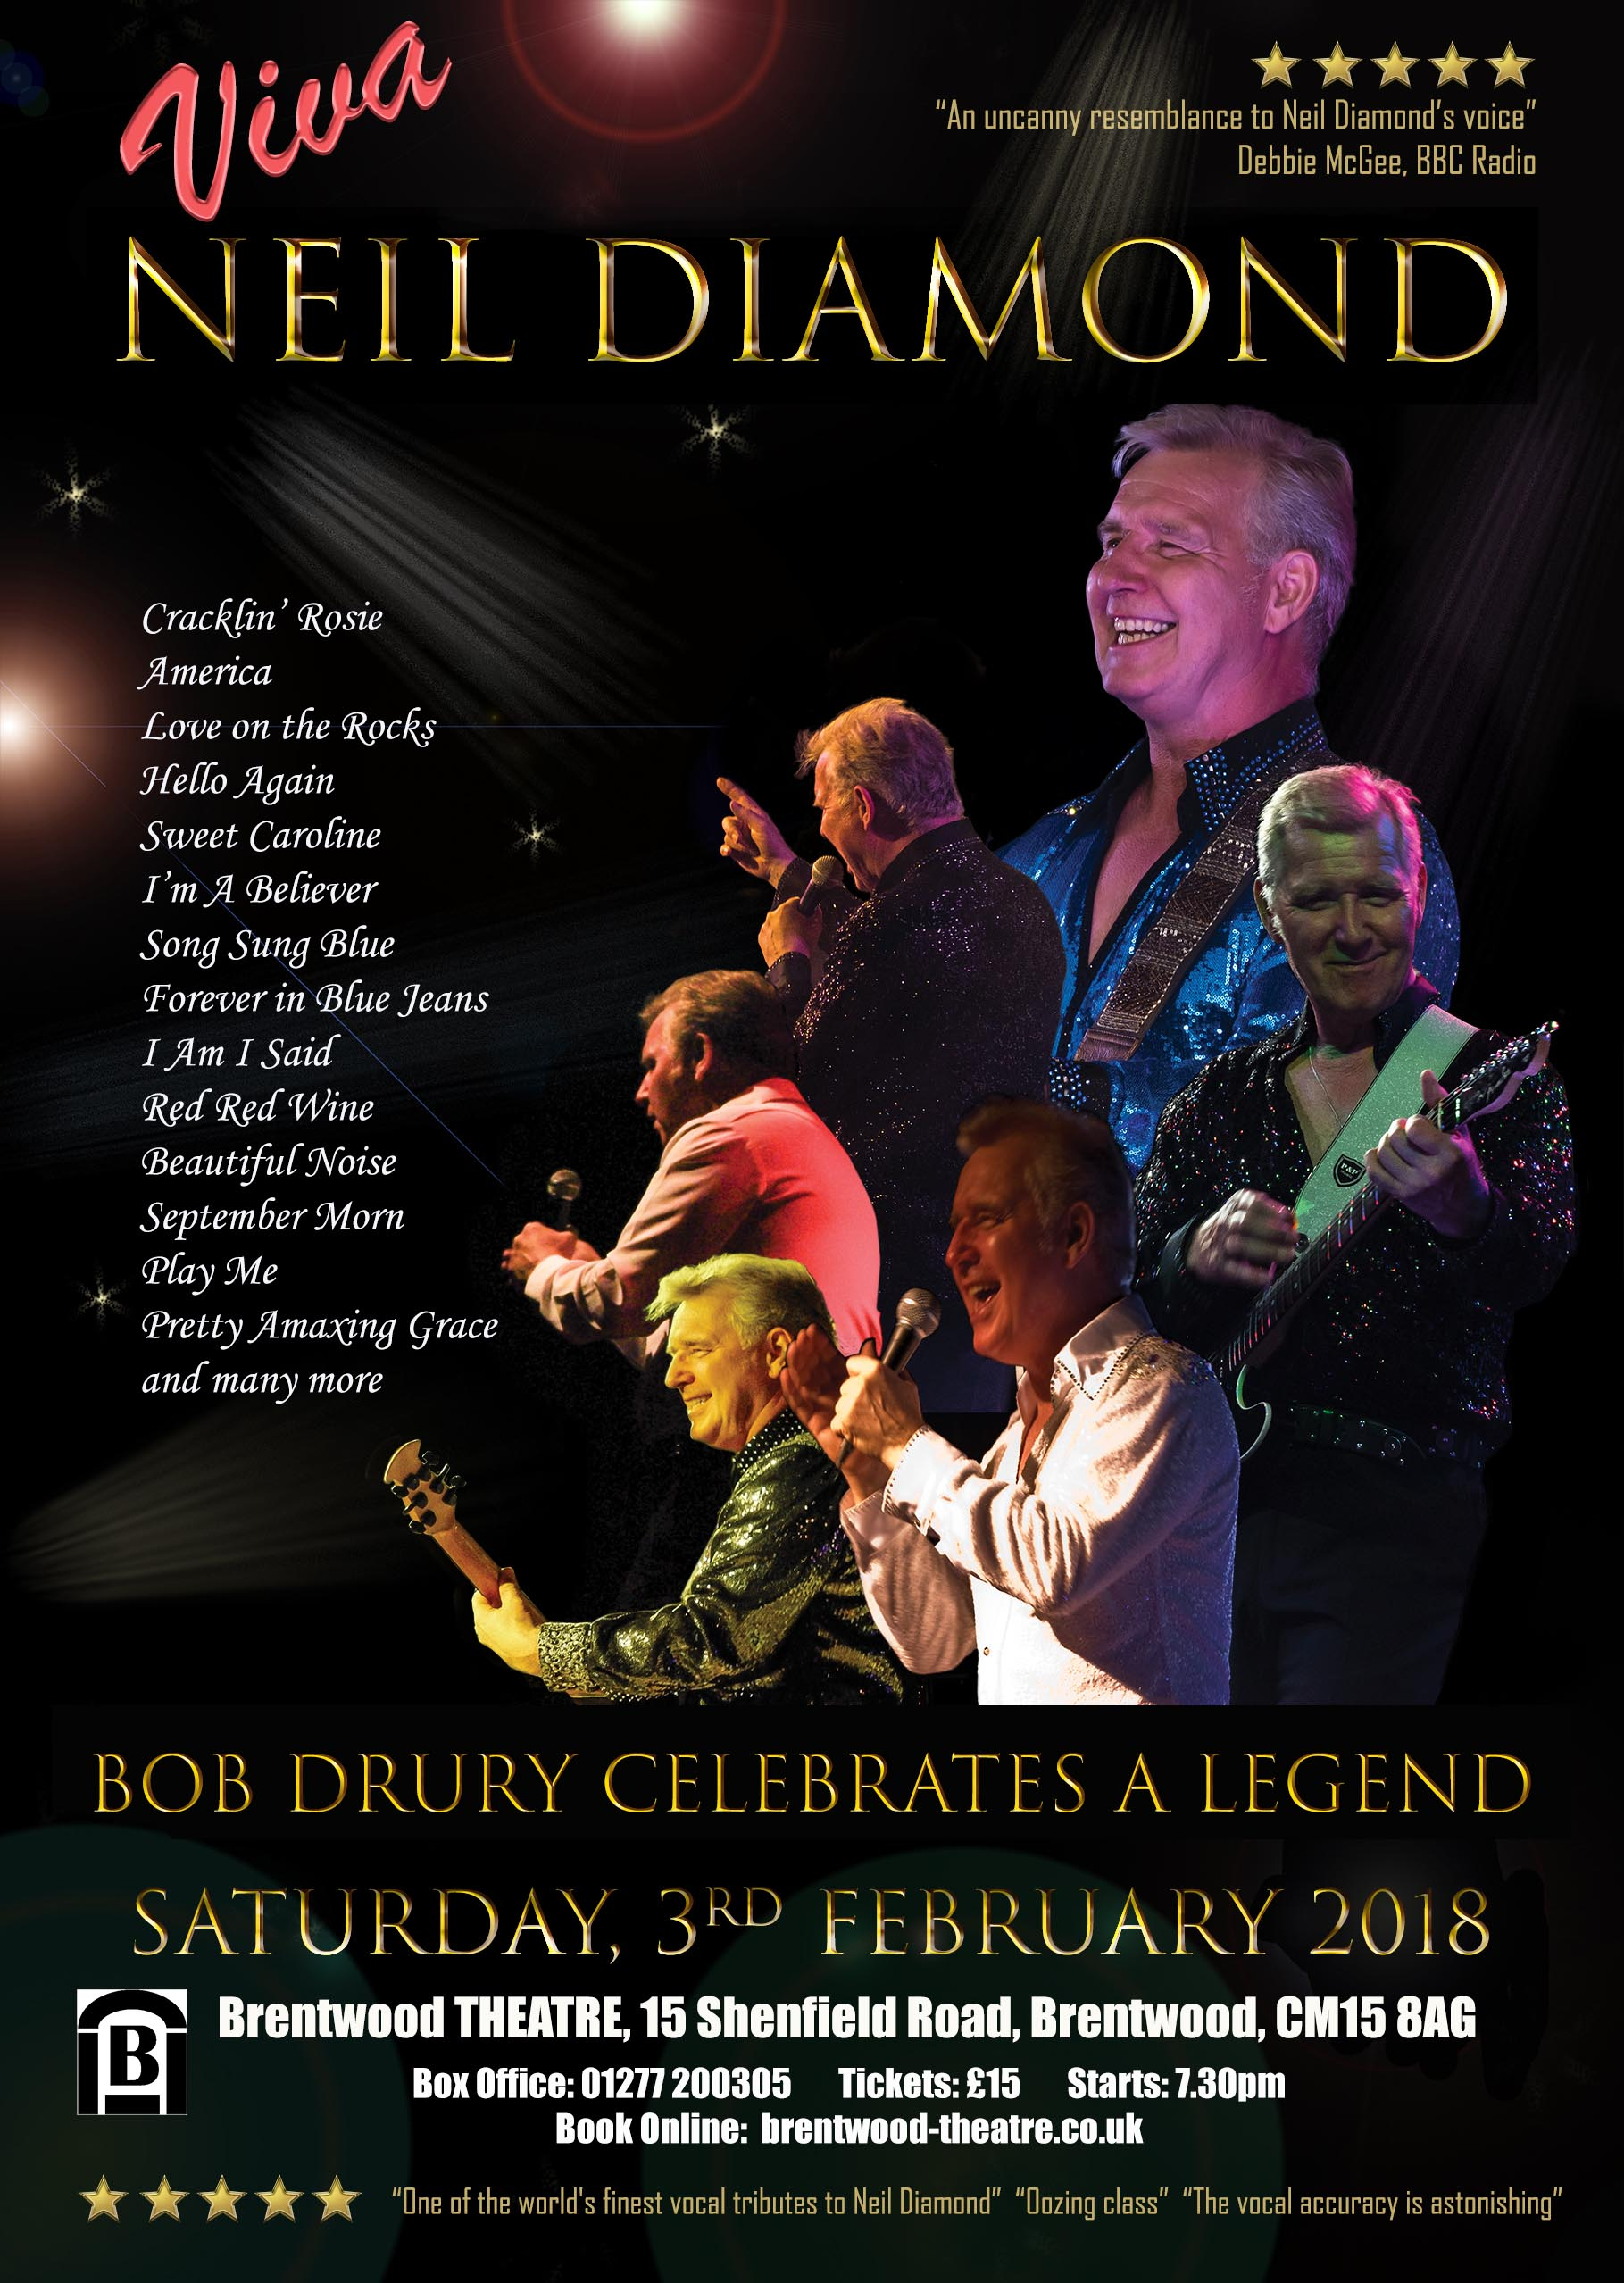 Bob Drury's VIVA NEIL DIAMOND | Brentwood Theatre